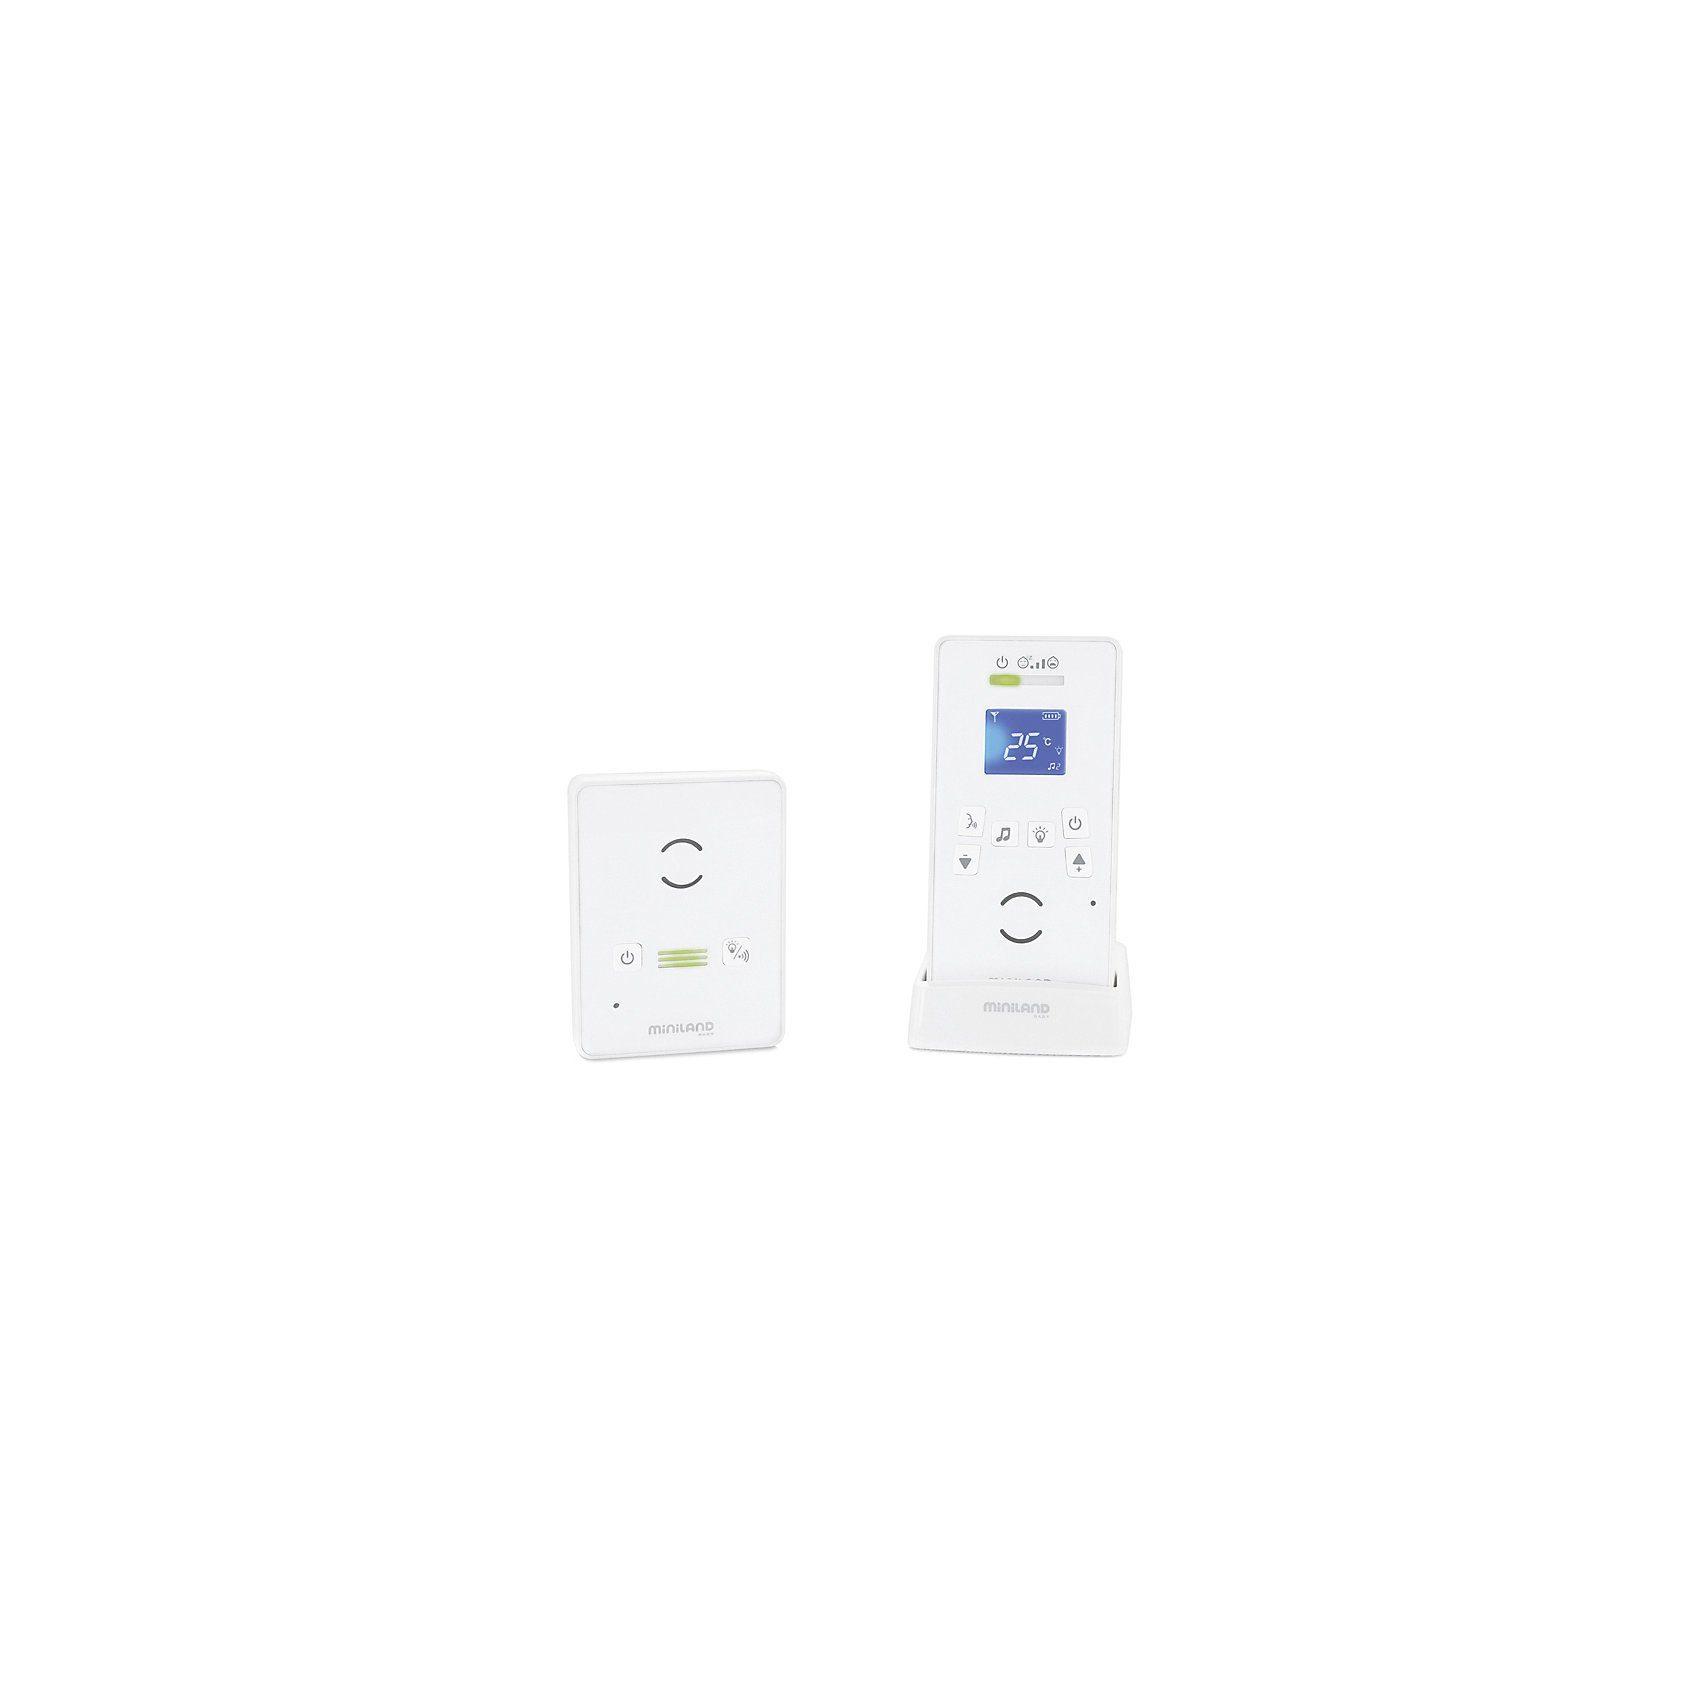 Miniland Babyphone Digitalk Luxe